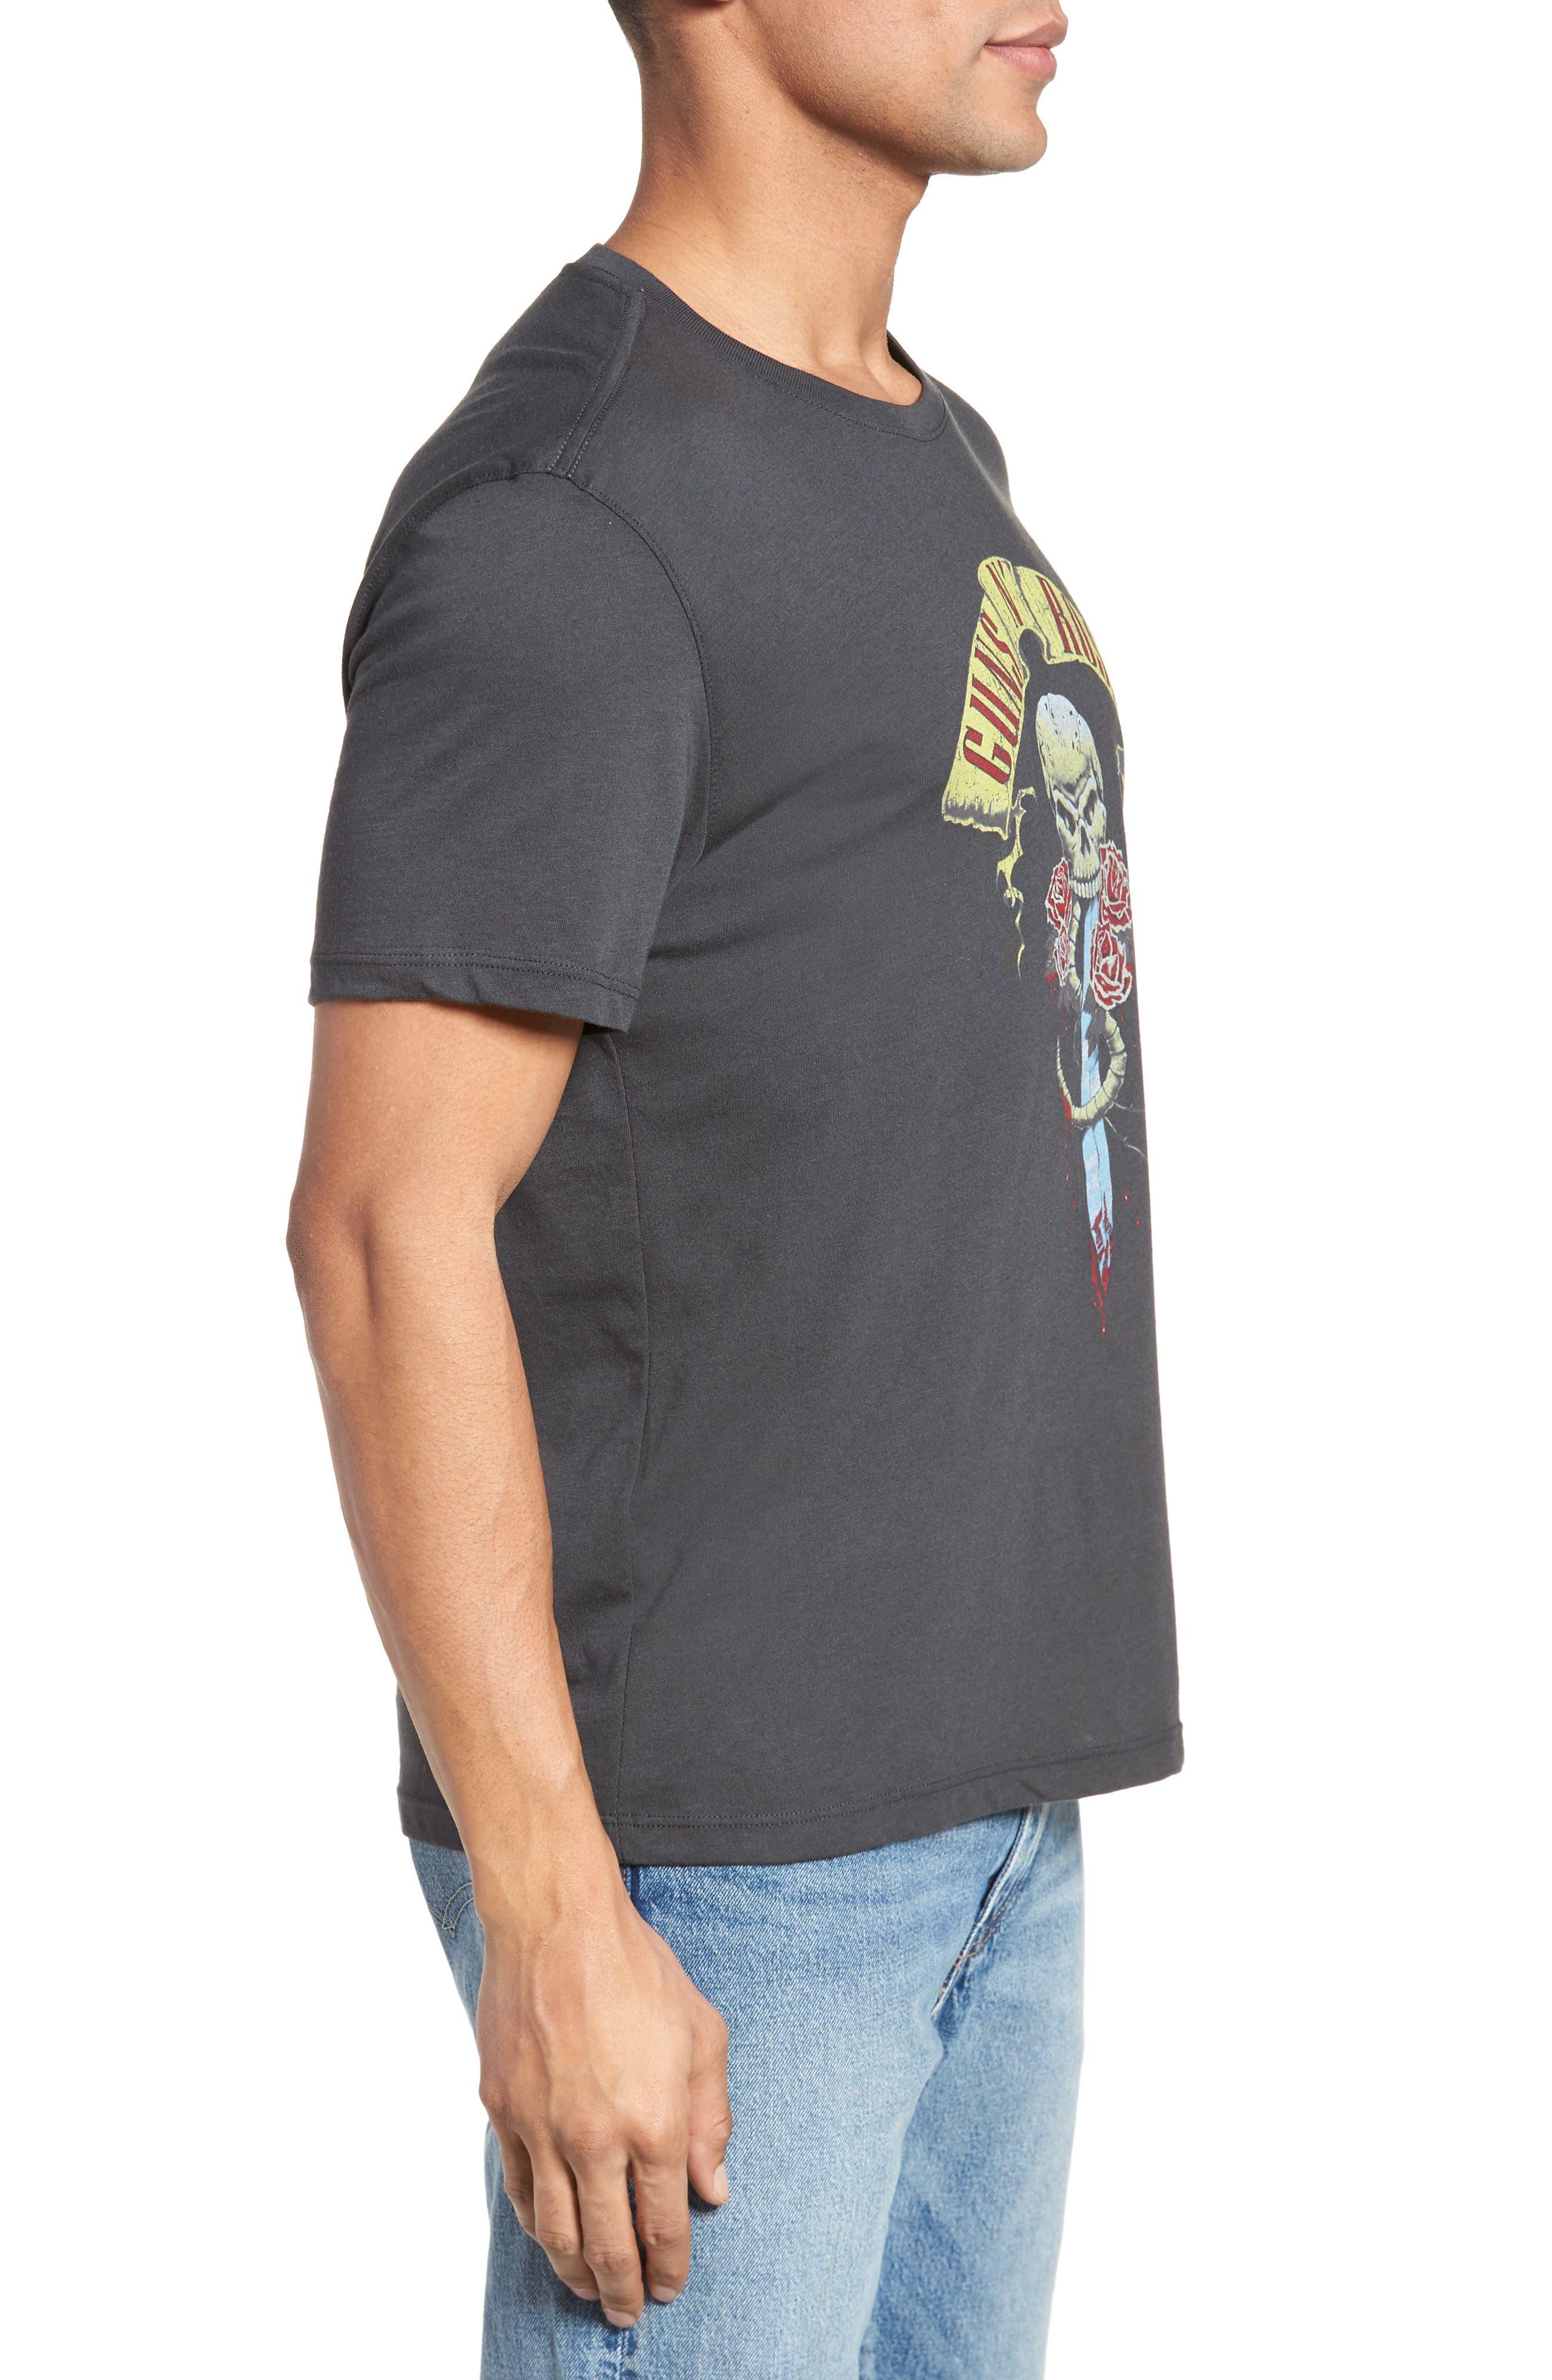 Guns N' Roses Graphic T-Shirt,                             Alternate thumbnail 3, color,